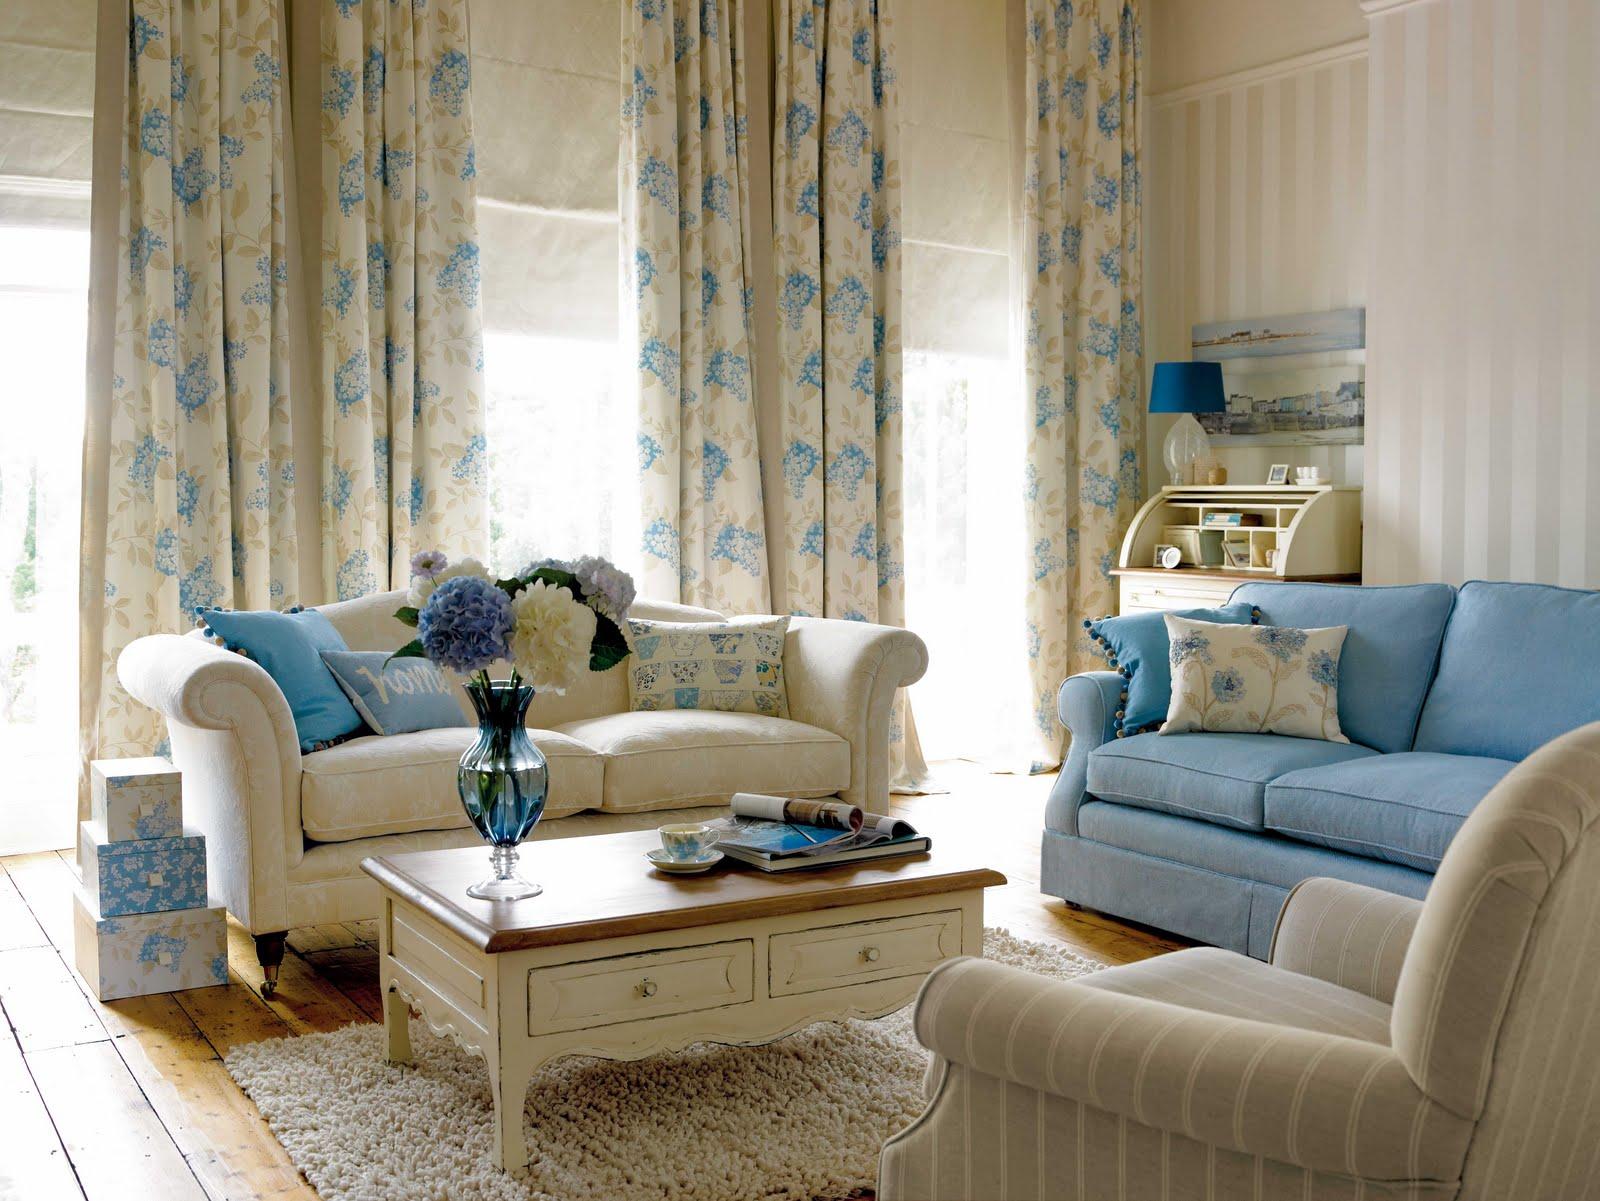 meltem erent rk laura ashley ile mavinin derinliklerine nin. Black Bedroom Furniture Sets. Home Design Ideas